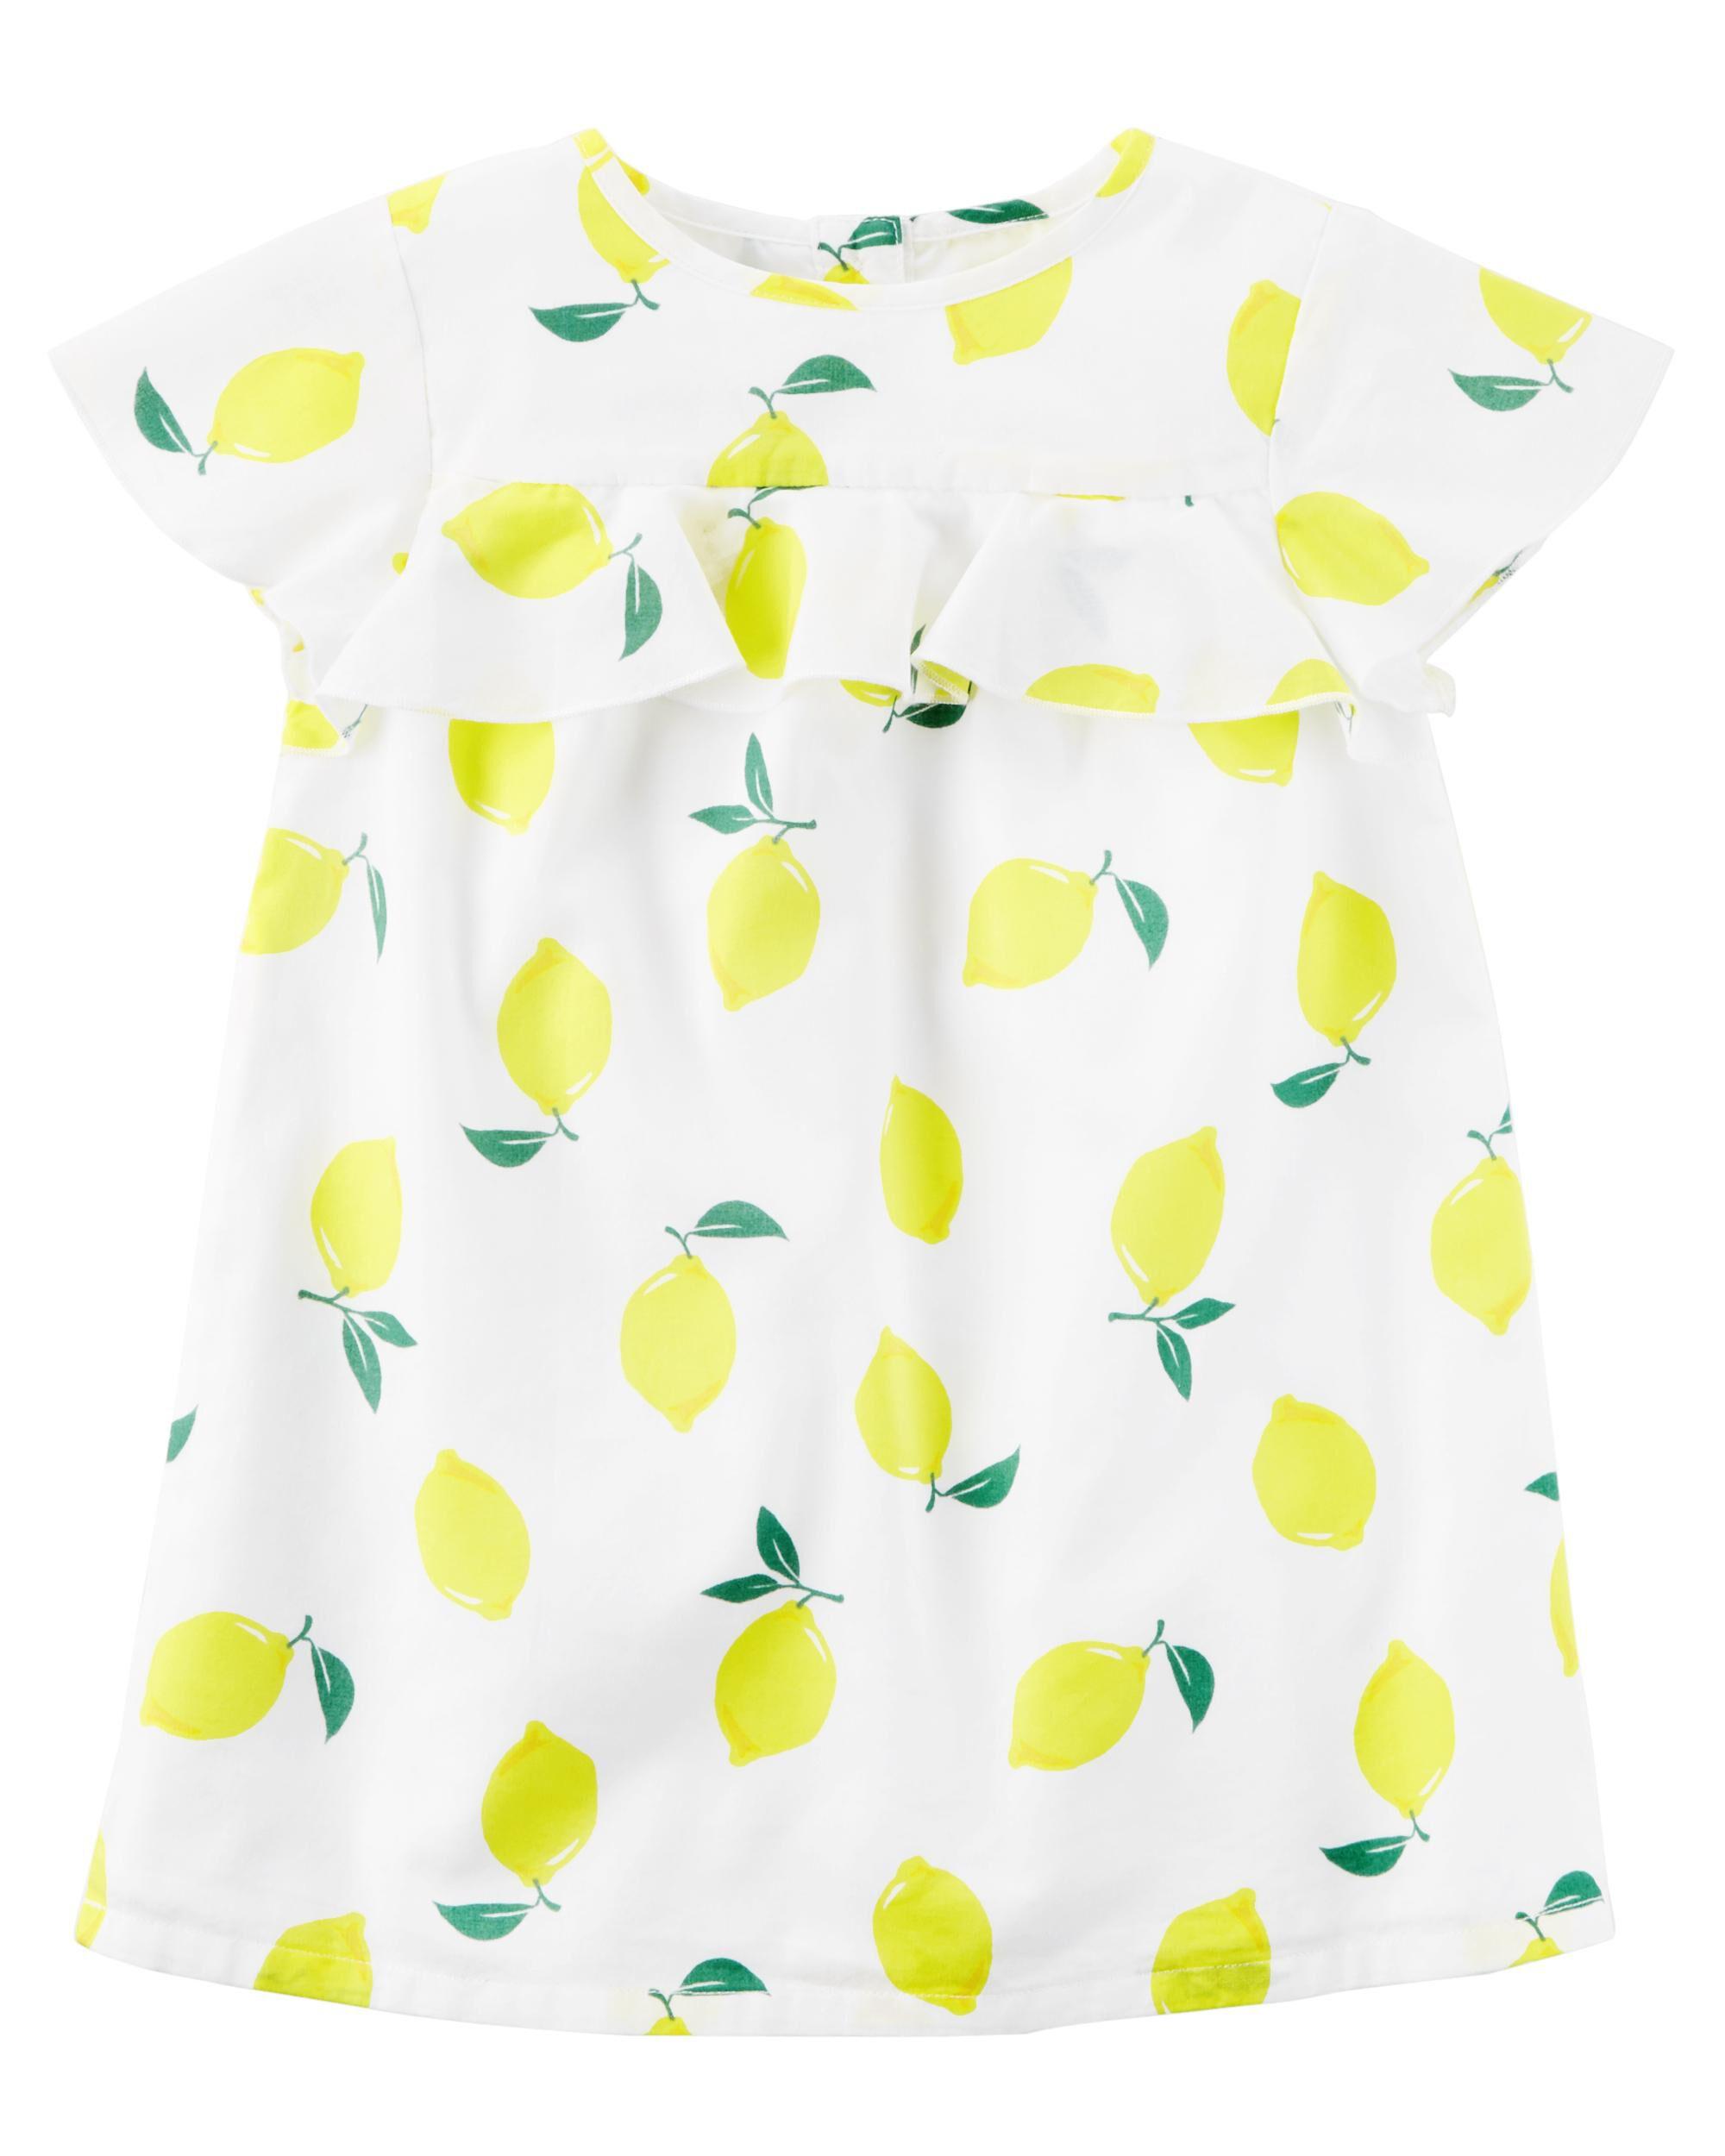 Lemon Ruffle Dress